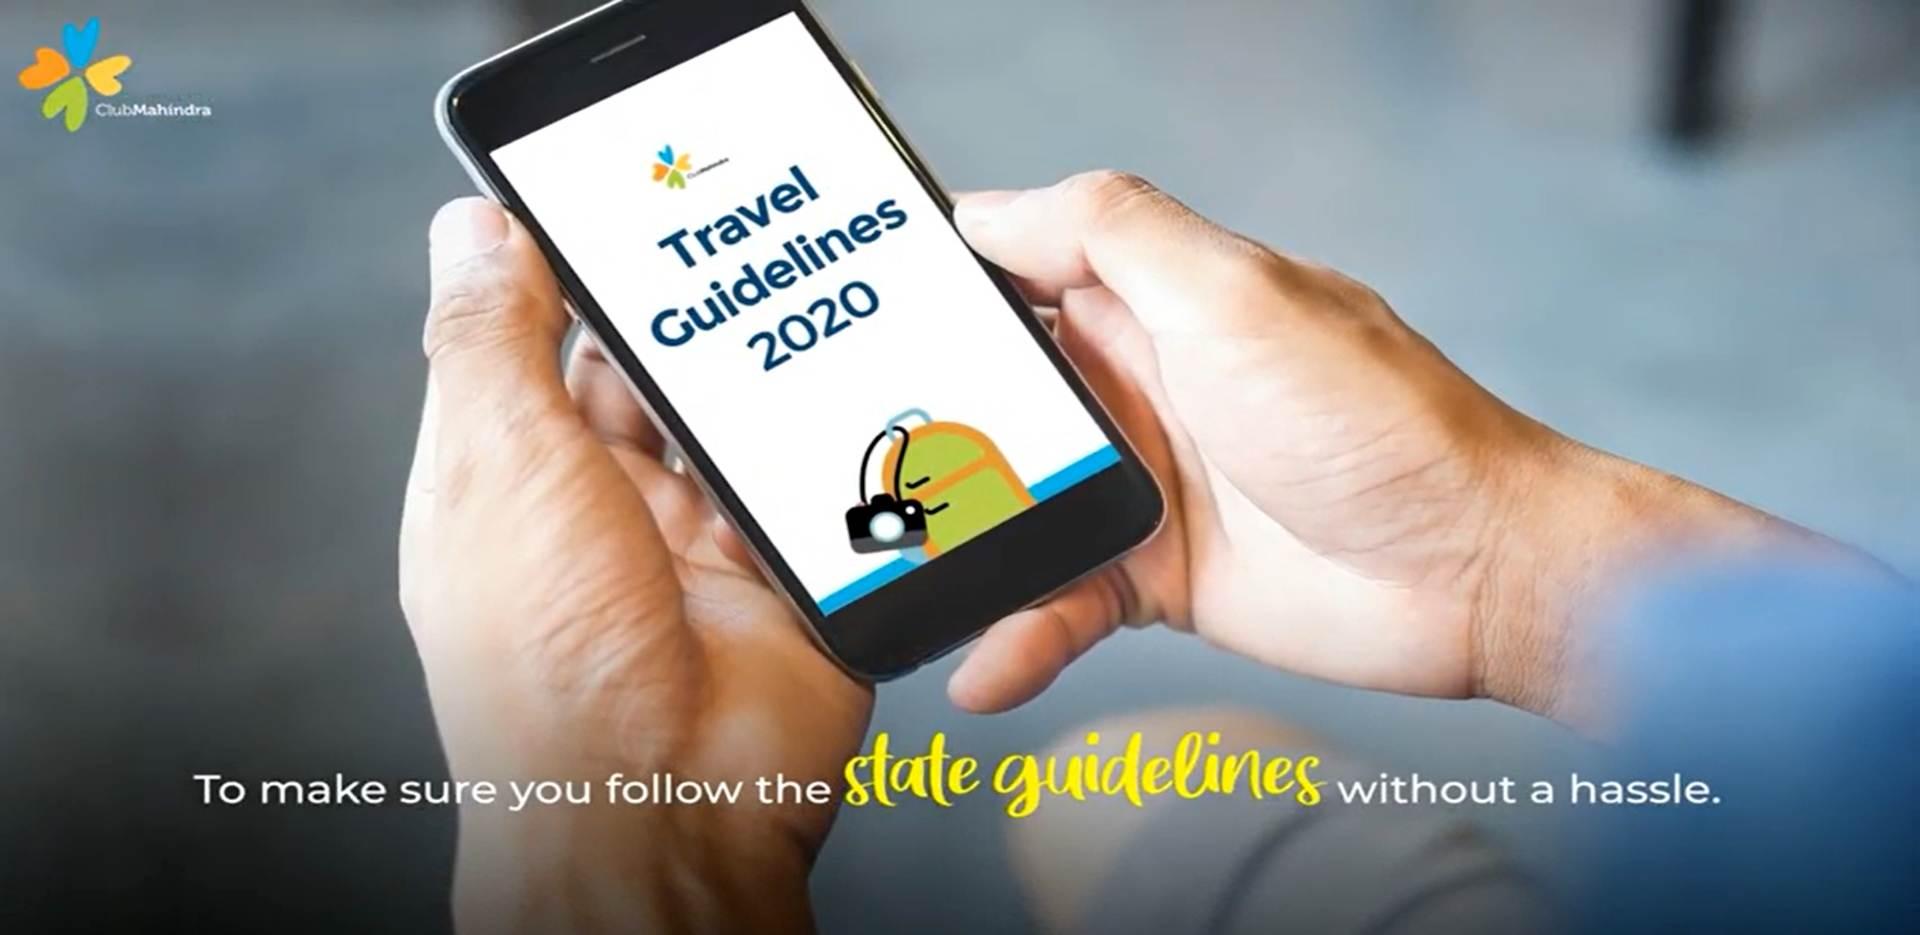 Maharashtra travel guidelines